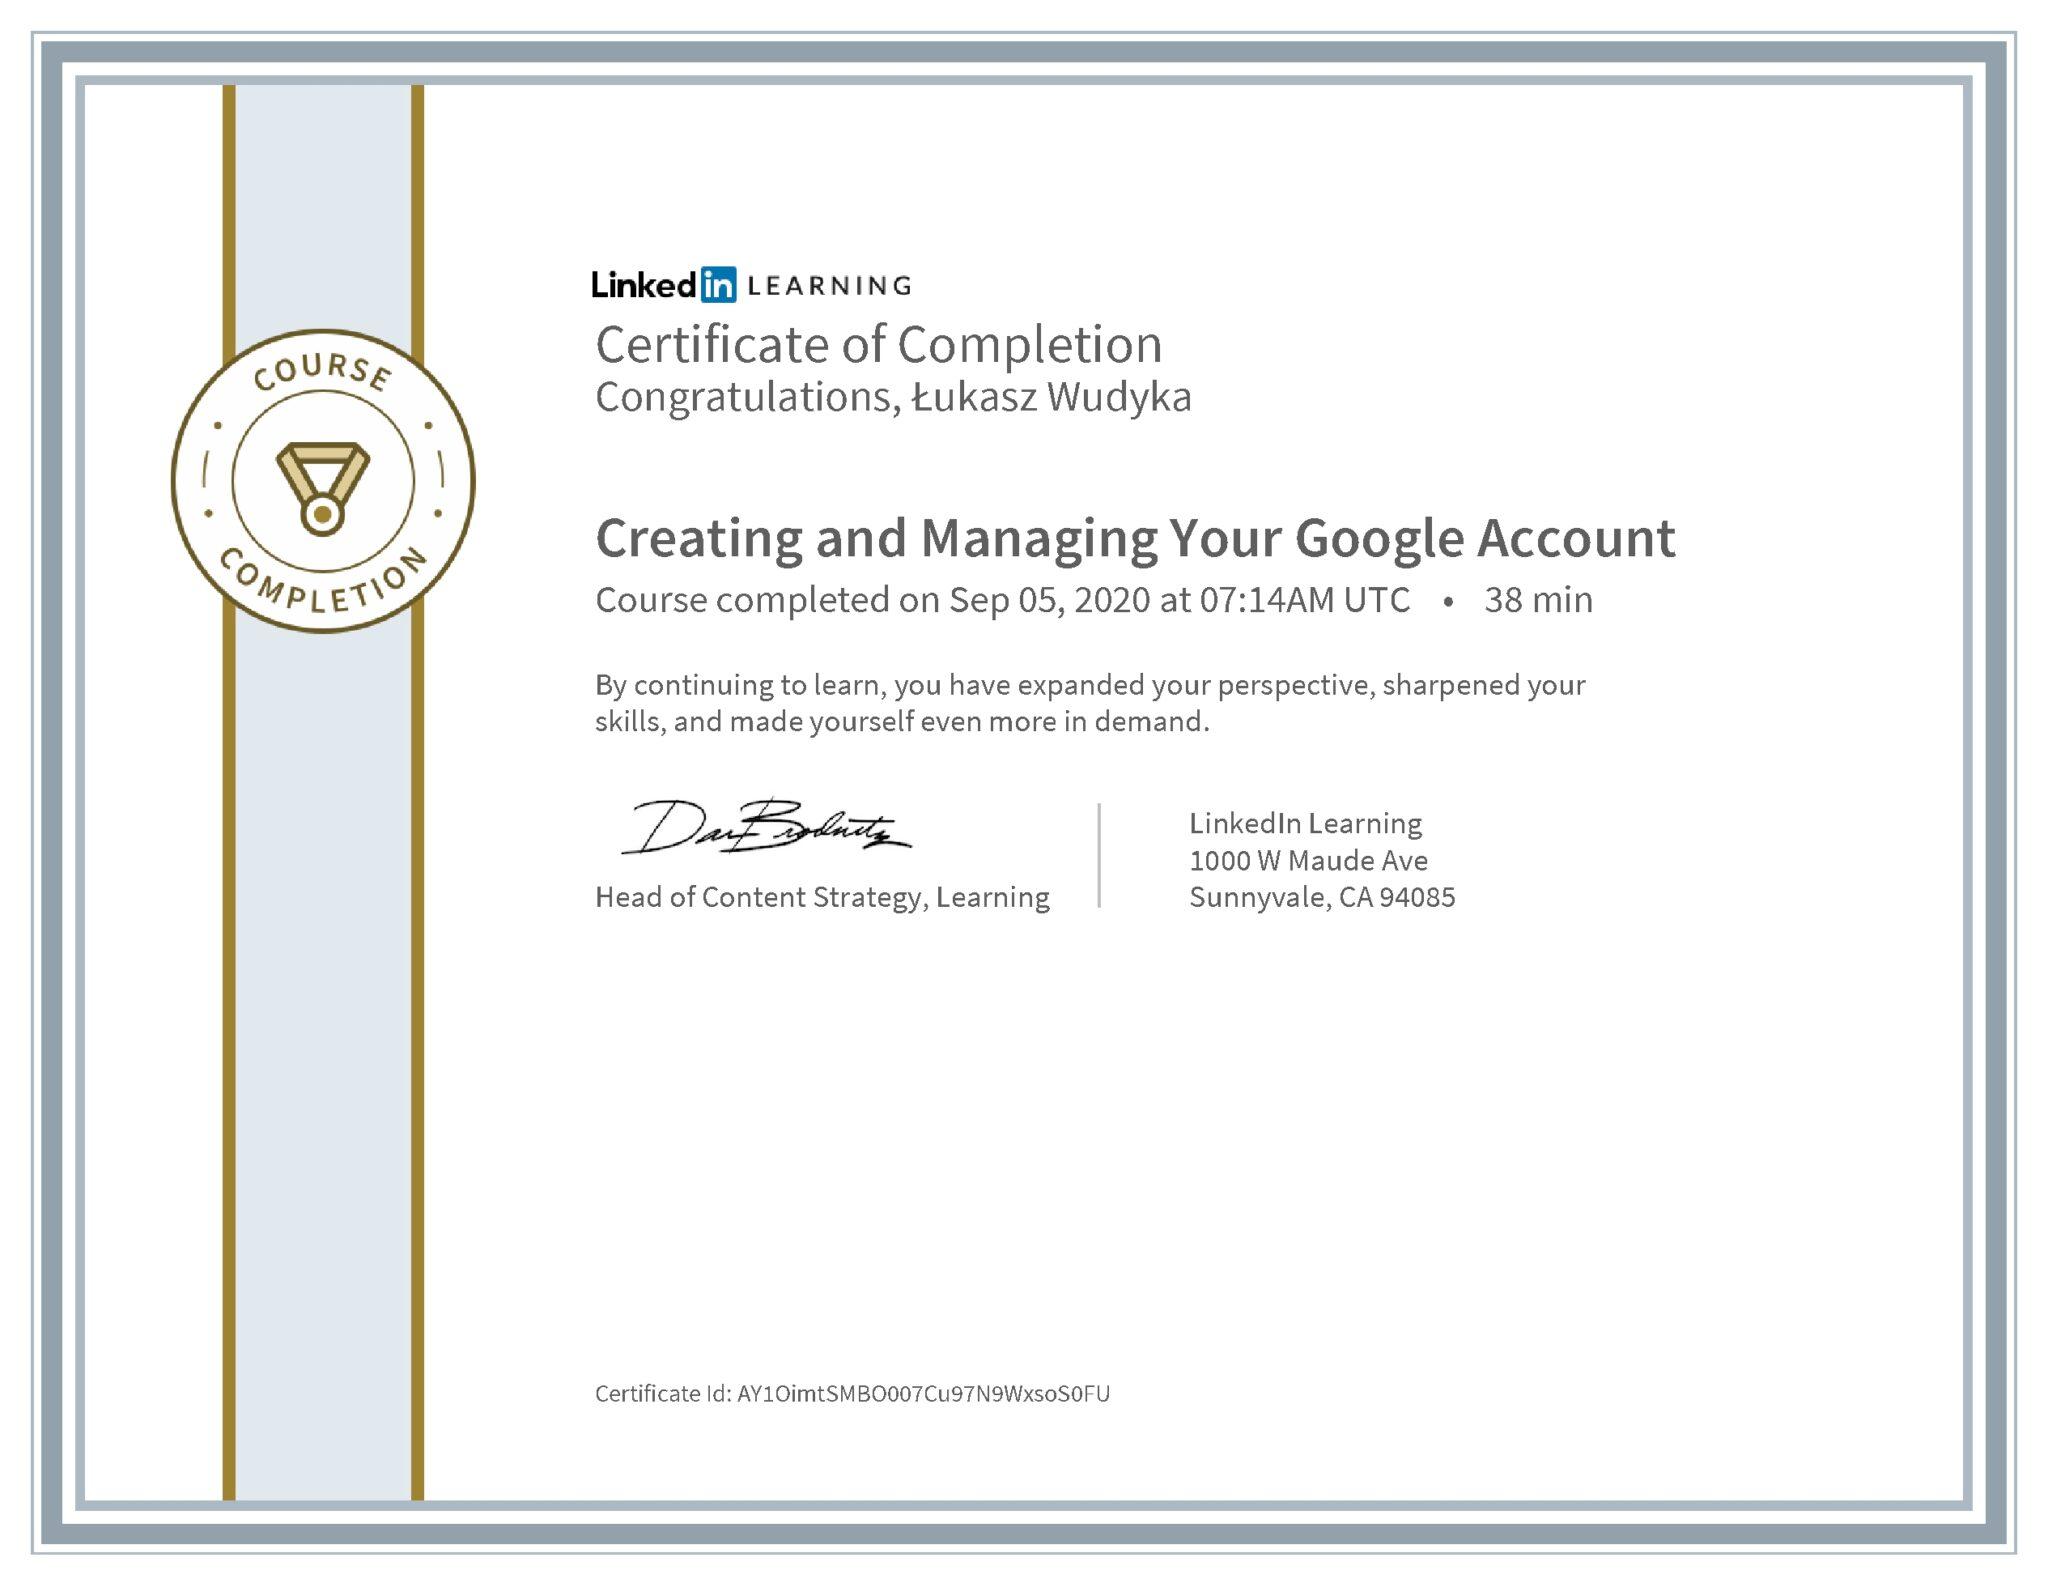 Łukasz Wudyka certyfikat LinkedIn Creating and Managing Your Google Account